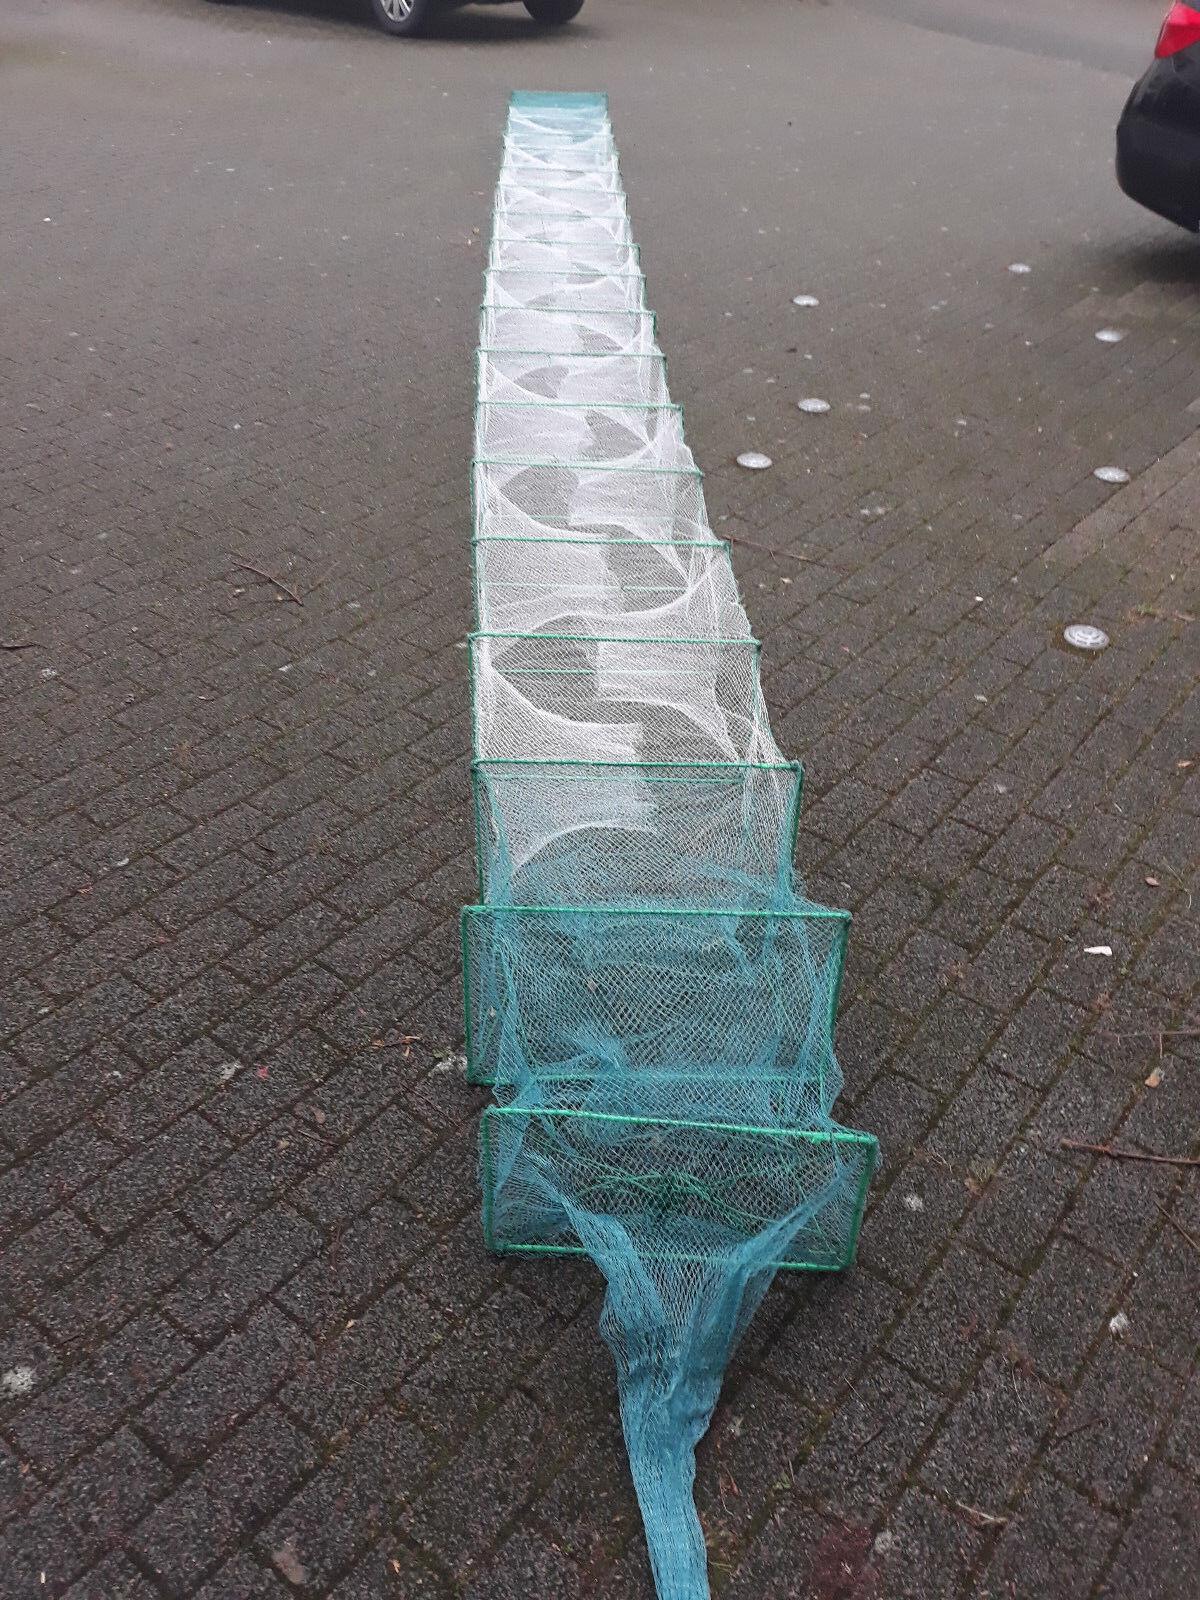 Für Profi Reuse Aalreuse Aal Krebs flusskrebs shrimps  8,5 meter R-50x30cm  limit buy